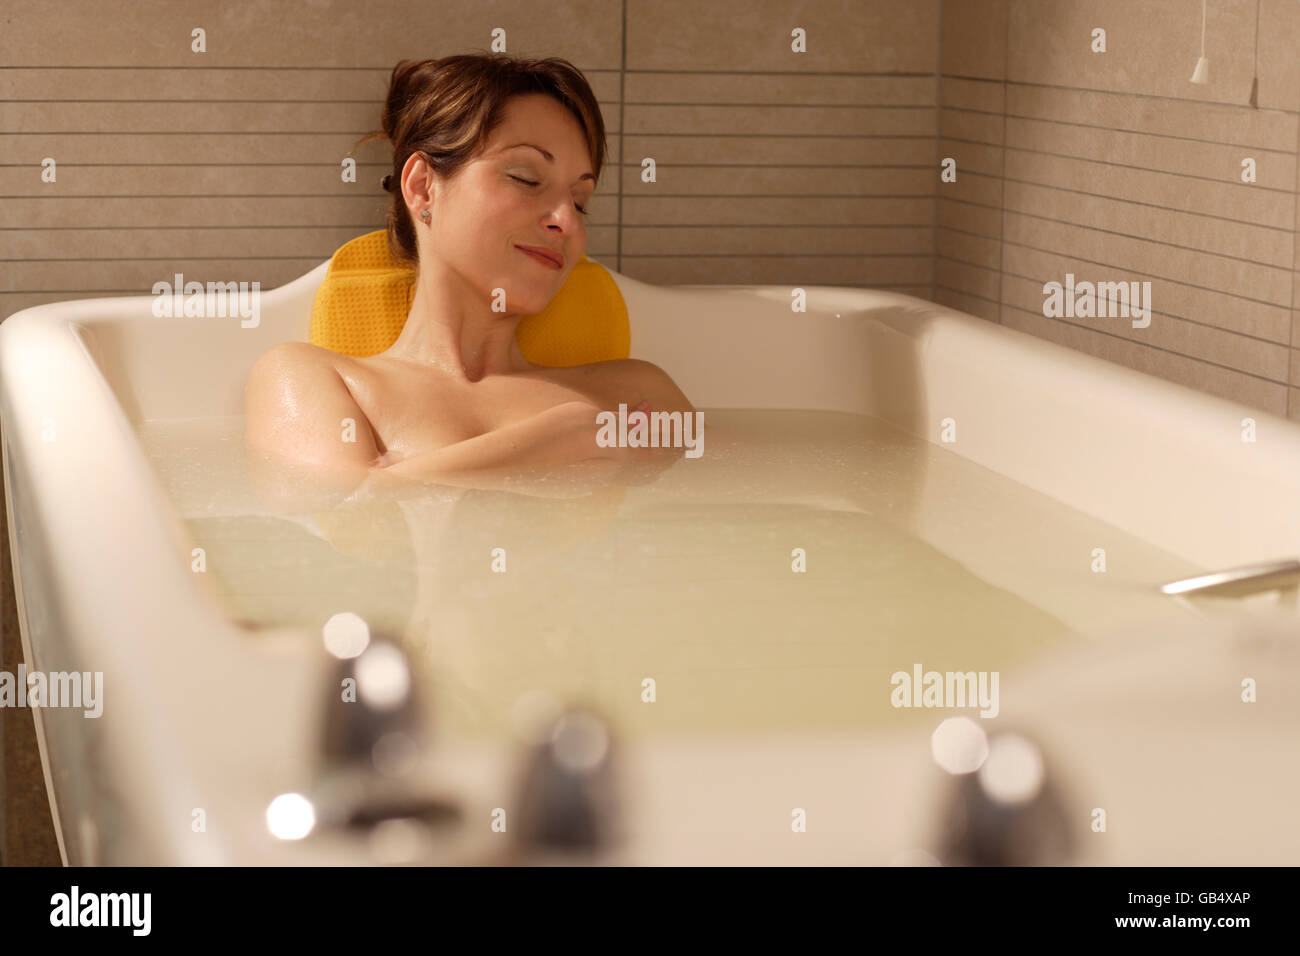 a4b970458d7 Woman, 35, relaxing in a bathtub, Aphrodite bath with whey, Thalasso ...